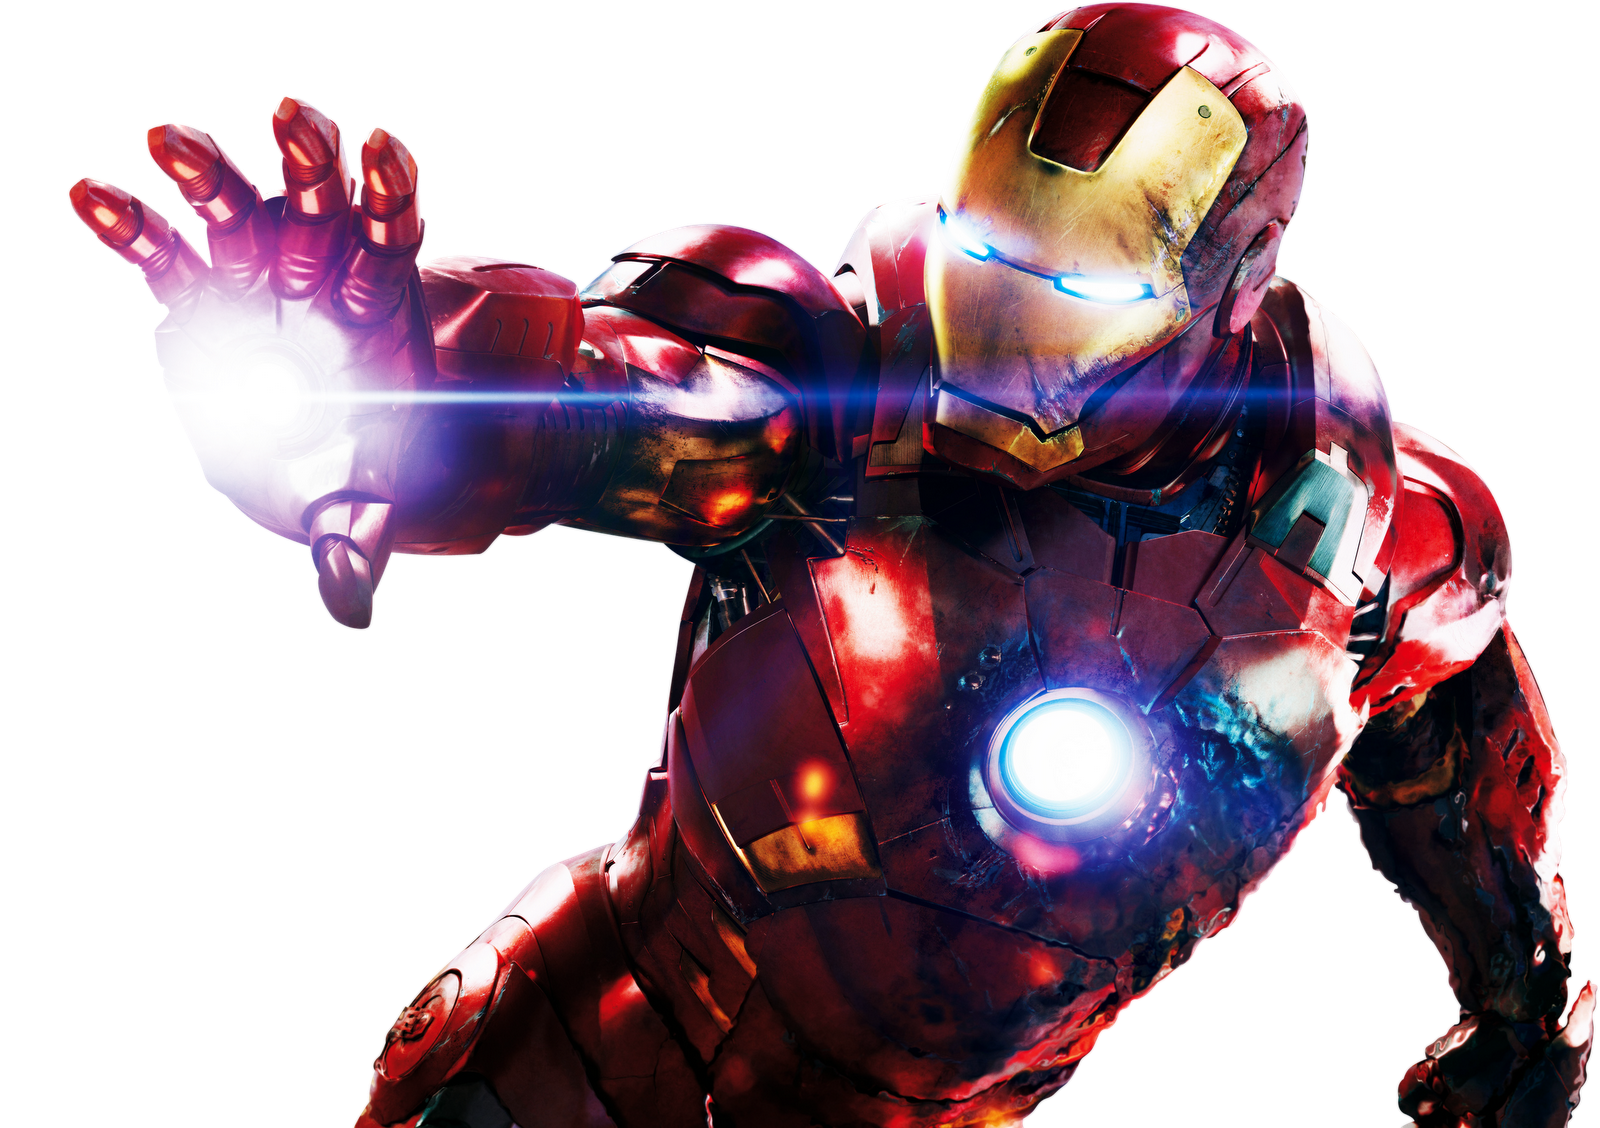 Download Iron Man Transparent Background HQ PNG Image ...